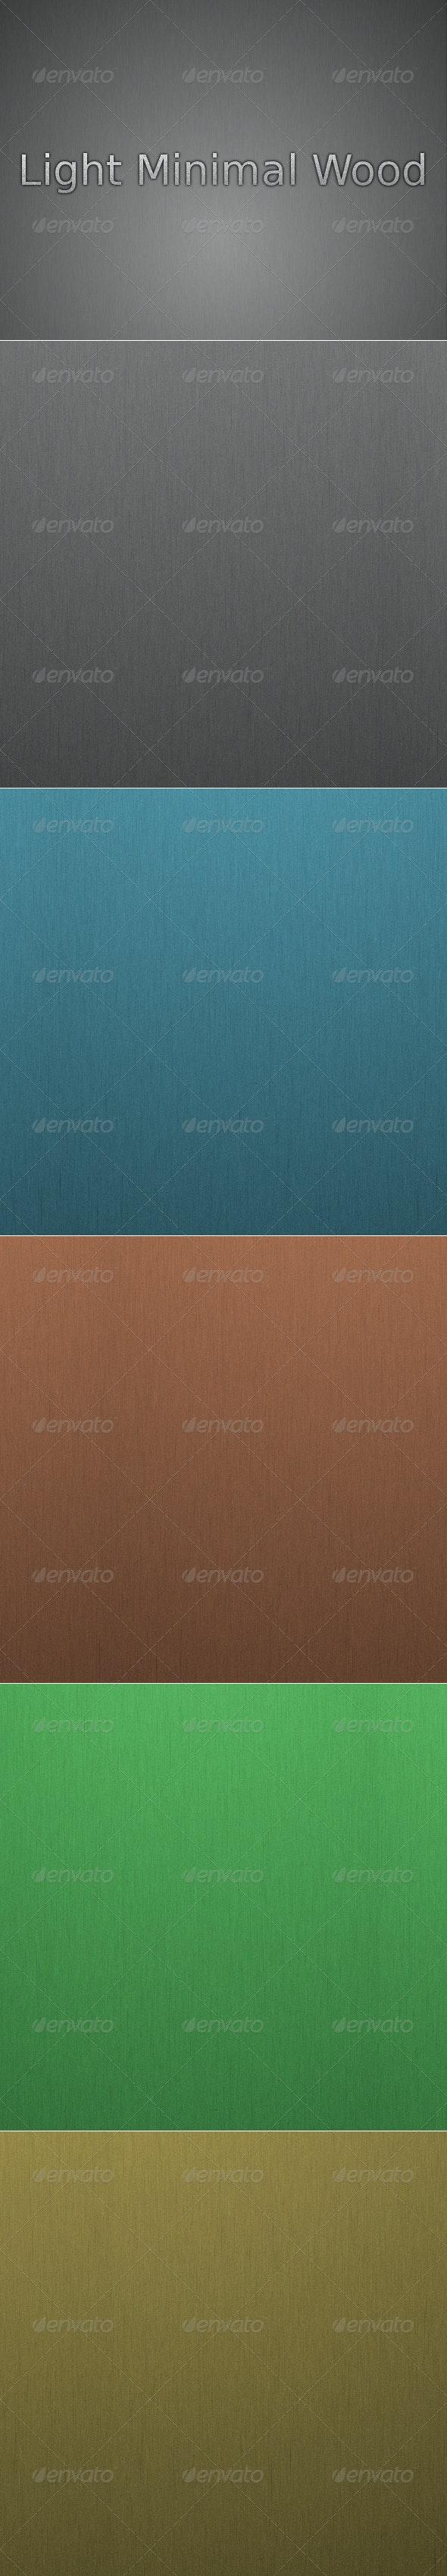 Light Minimal Wood Textures - Wood Textures